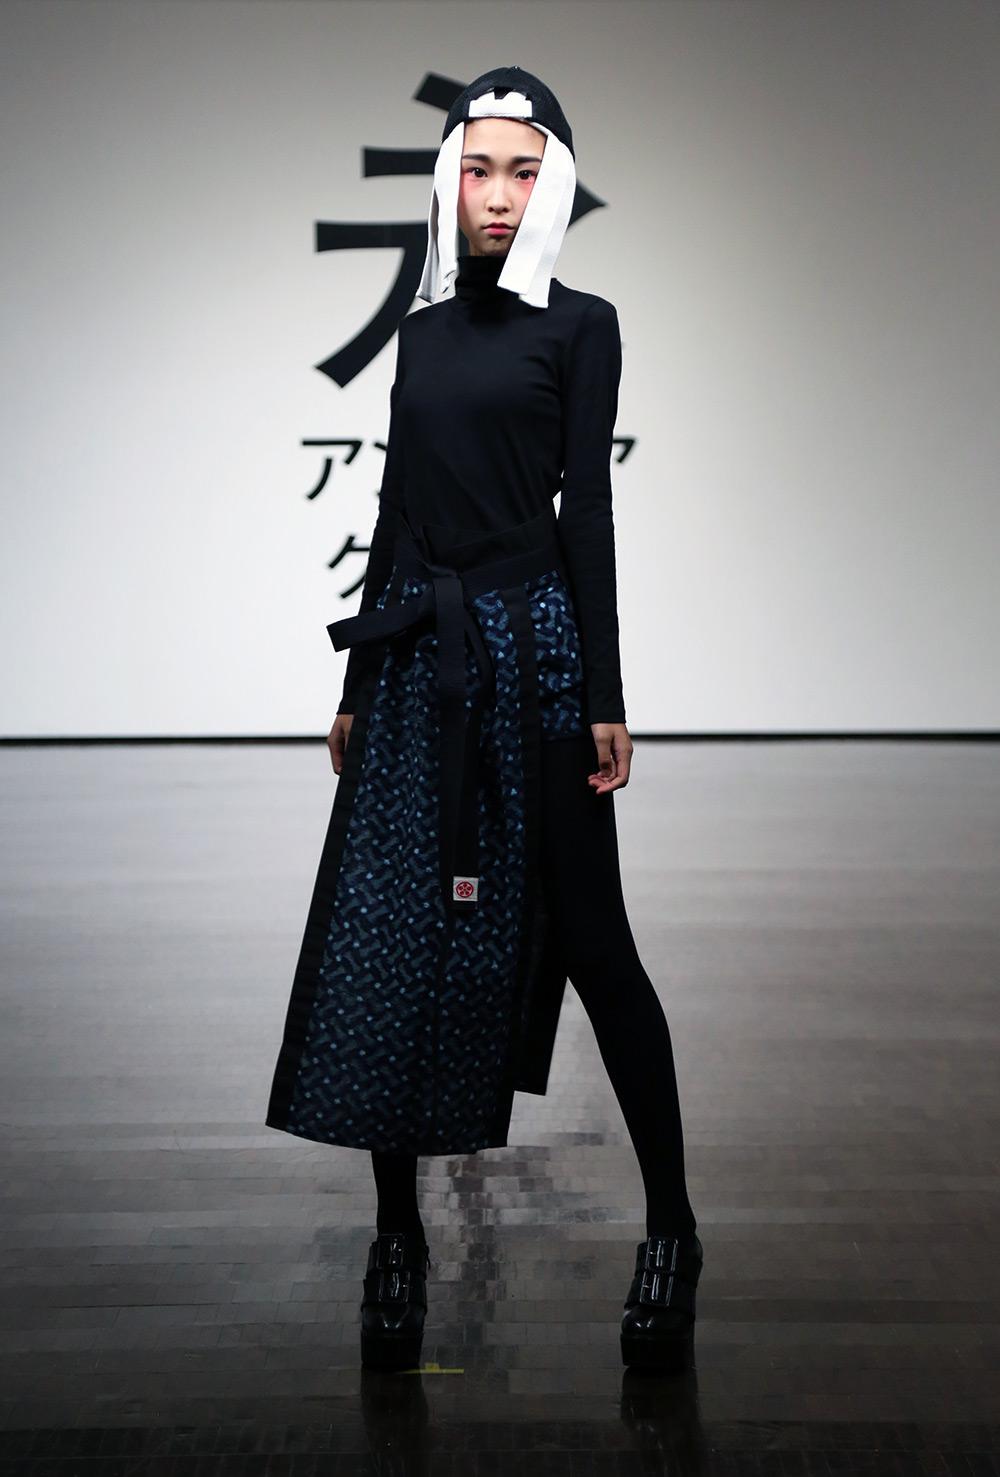 fashionphotobyjinyagi